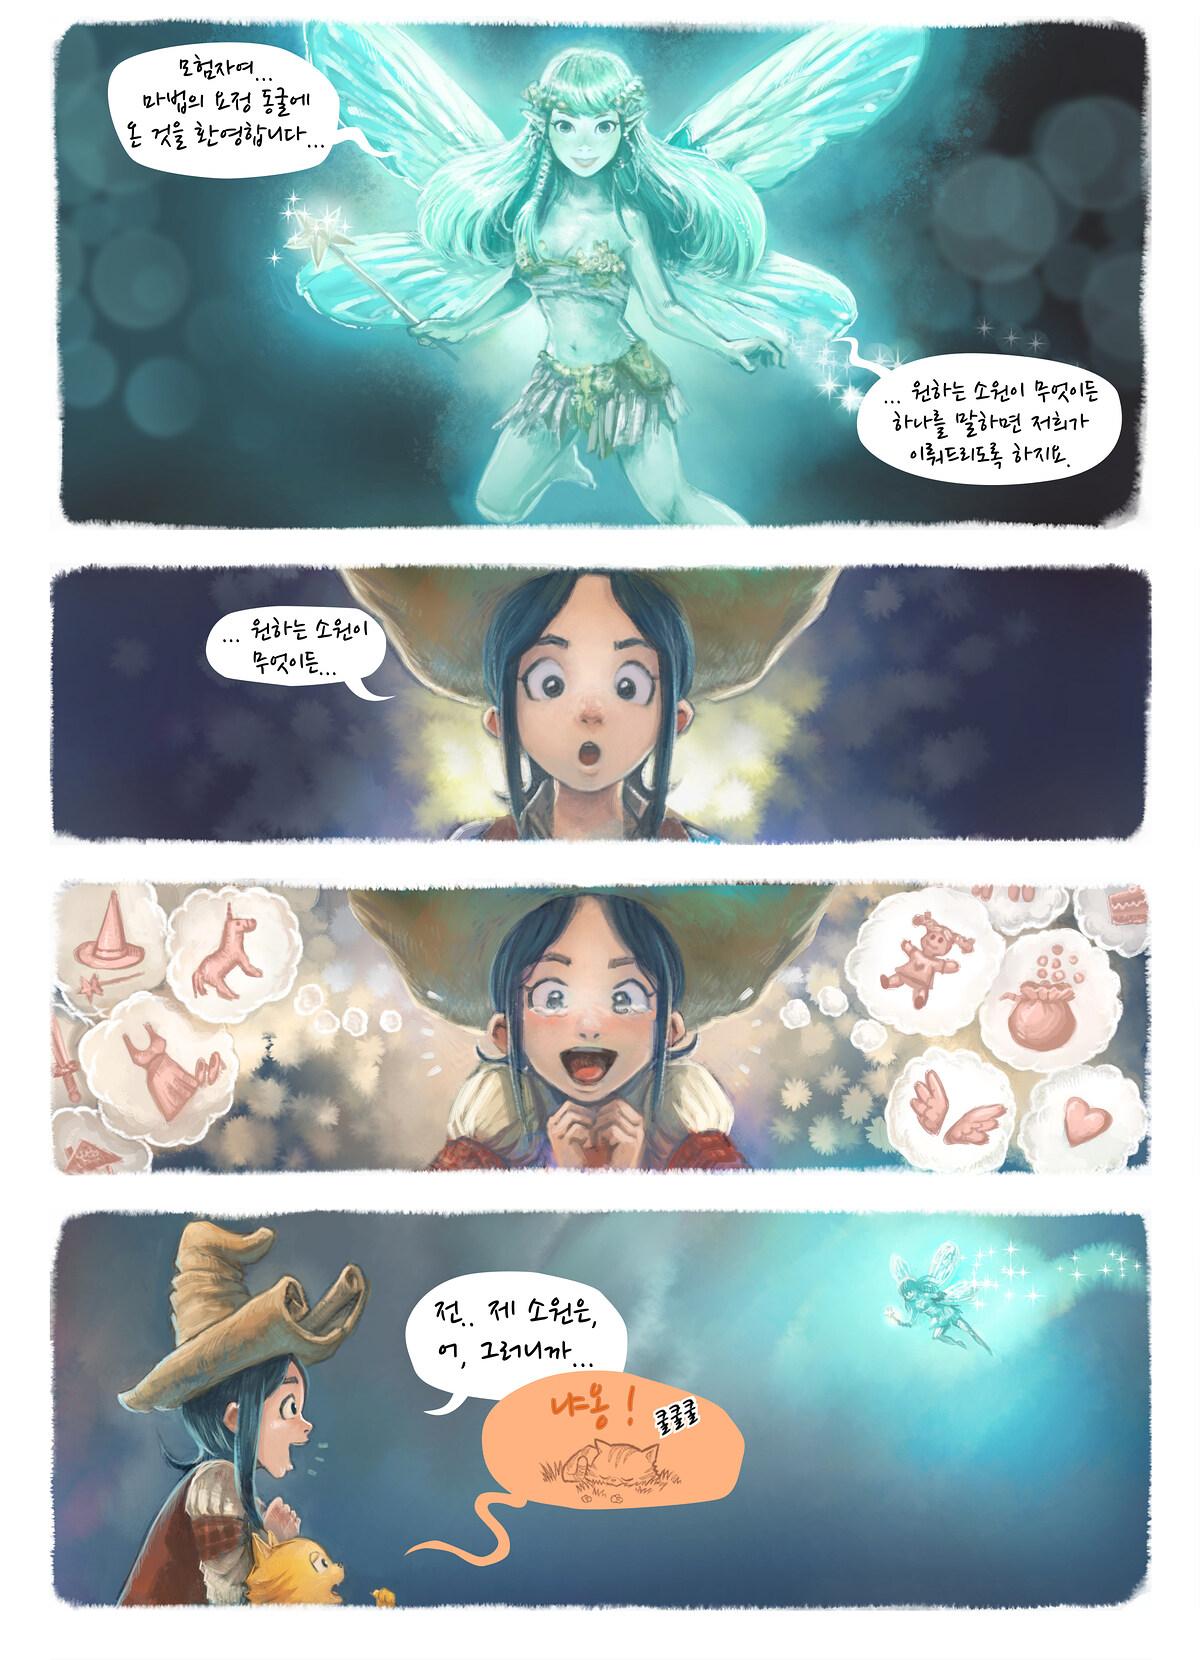 A webcomic page of Pepper&Carrot, 에피소드 7 [kr], 페이지 4